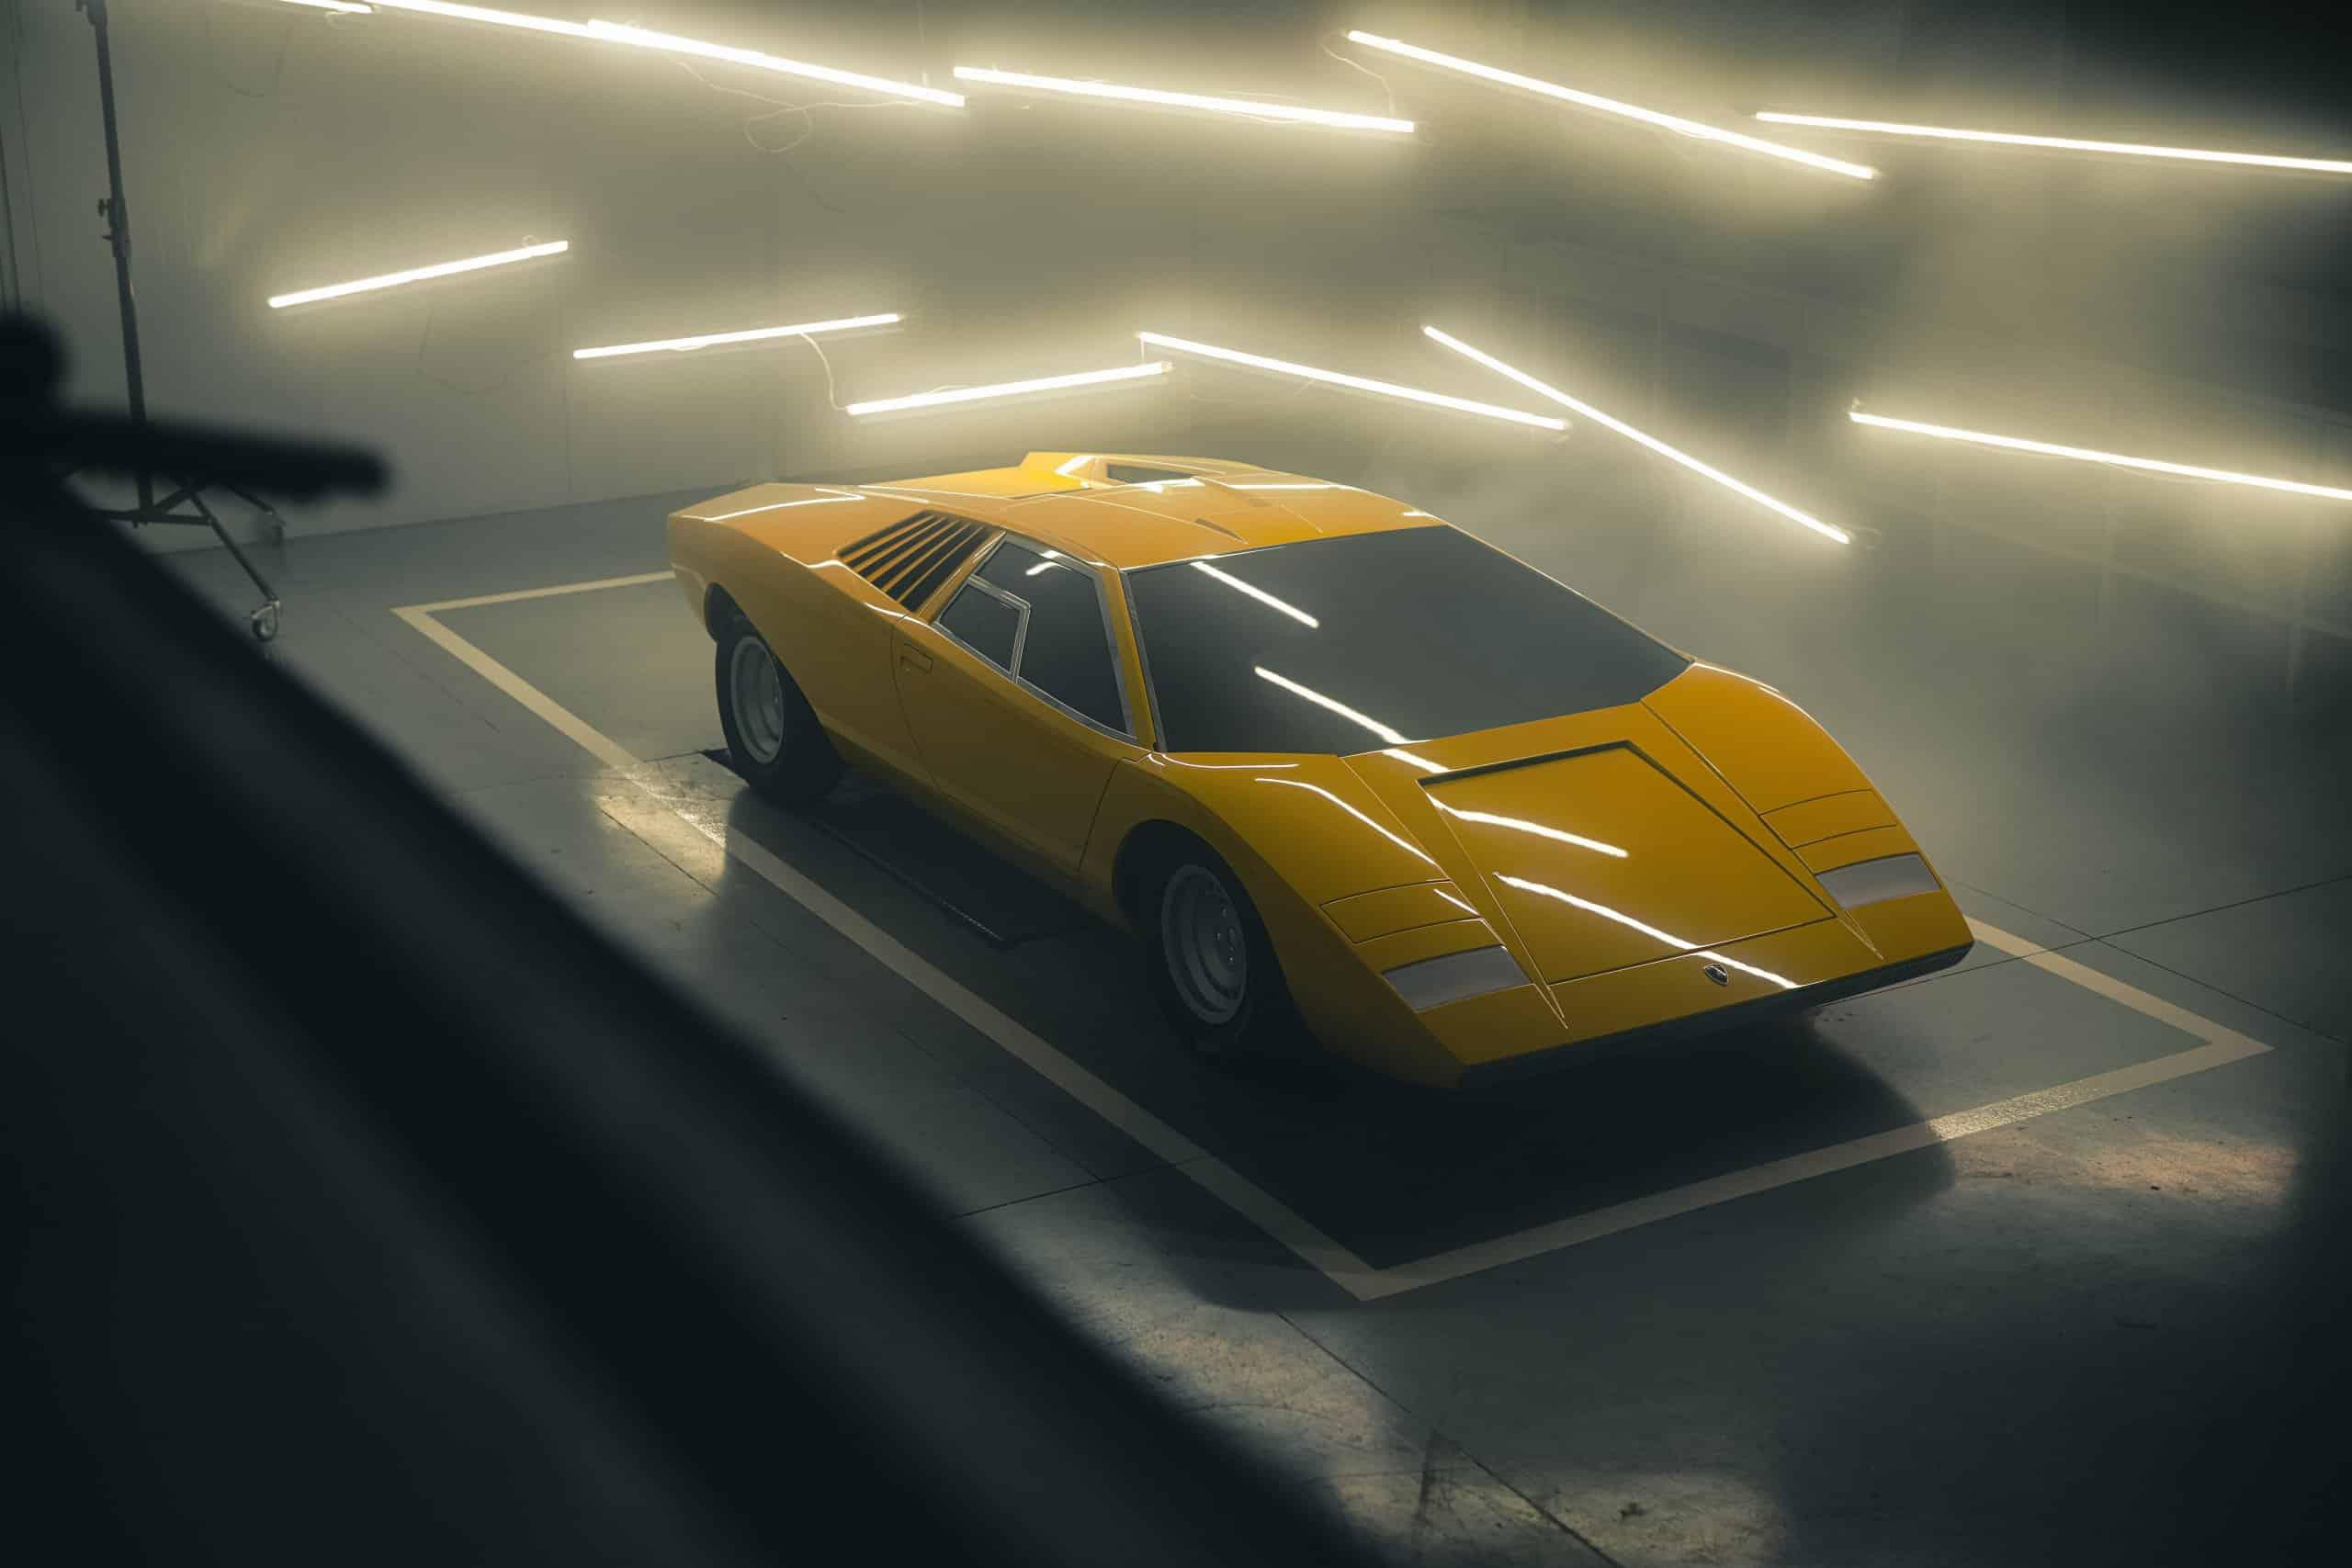 Reconstructed Countach LP 500 | Lamborghini photos